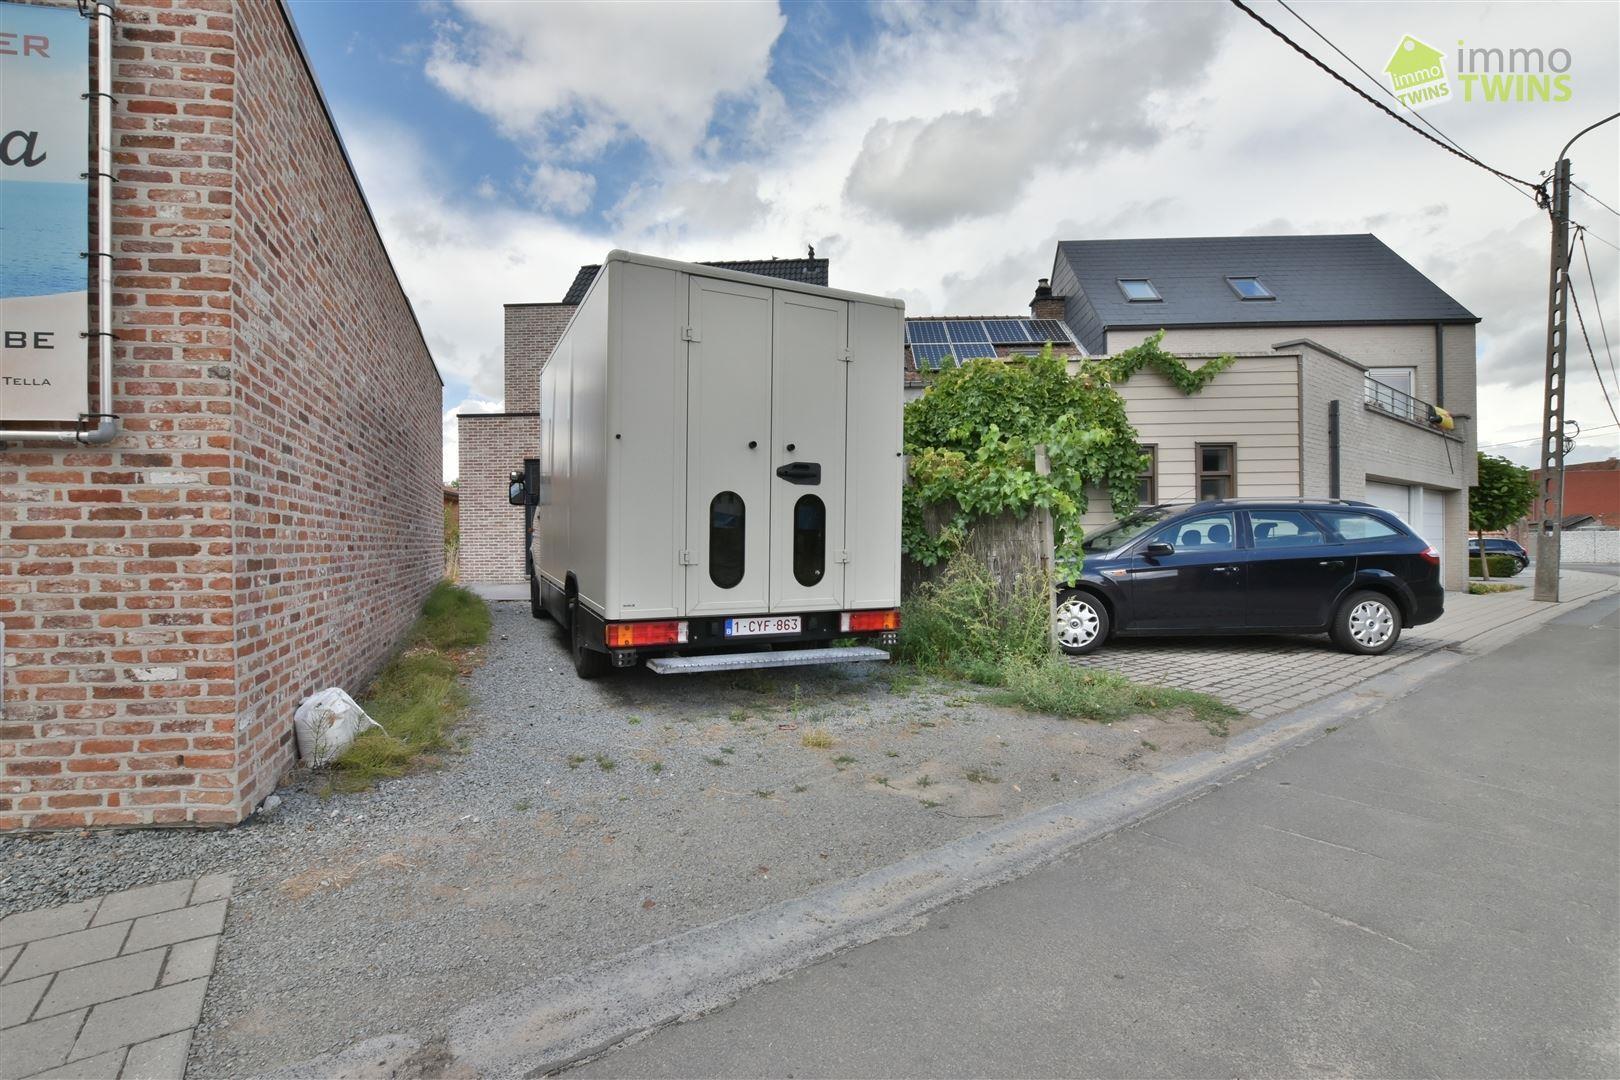 Foto 20 : Woning te 9220 MOERZEKE (België) - Prijs € 249.000